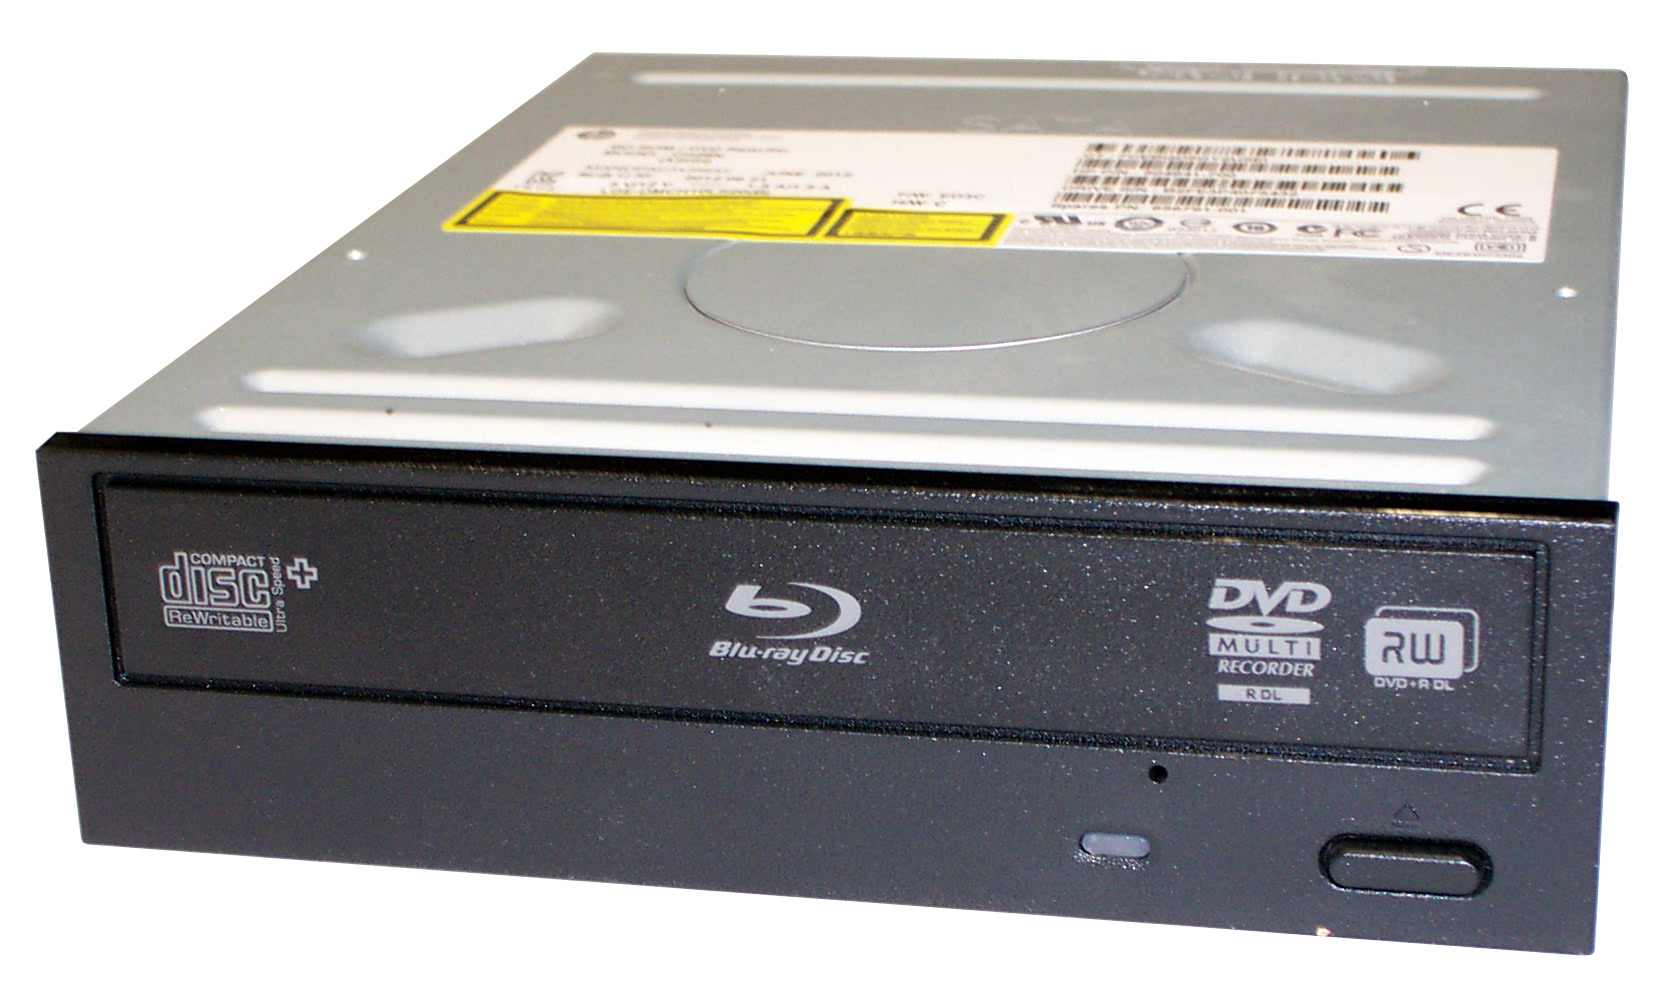 HP 504941-700 BD-ROM DVD Rewriter SATA Black Bezel Optical Drive - CH28N